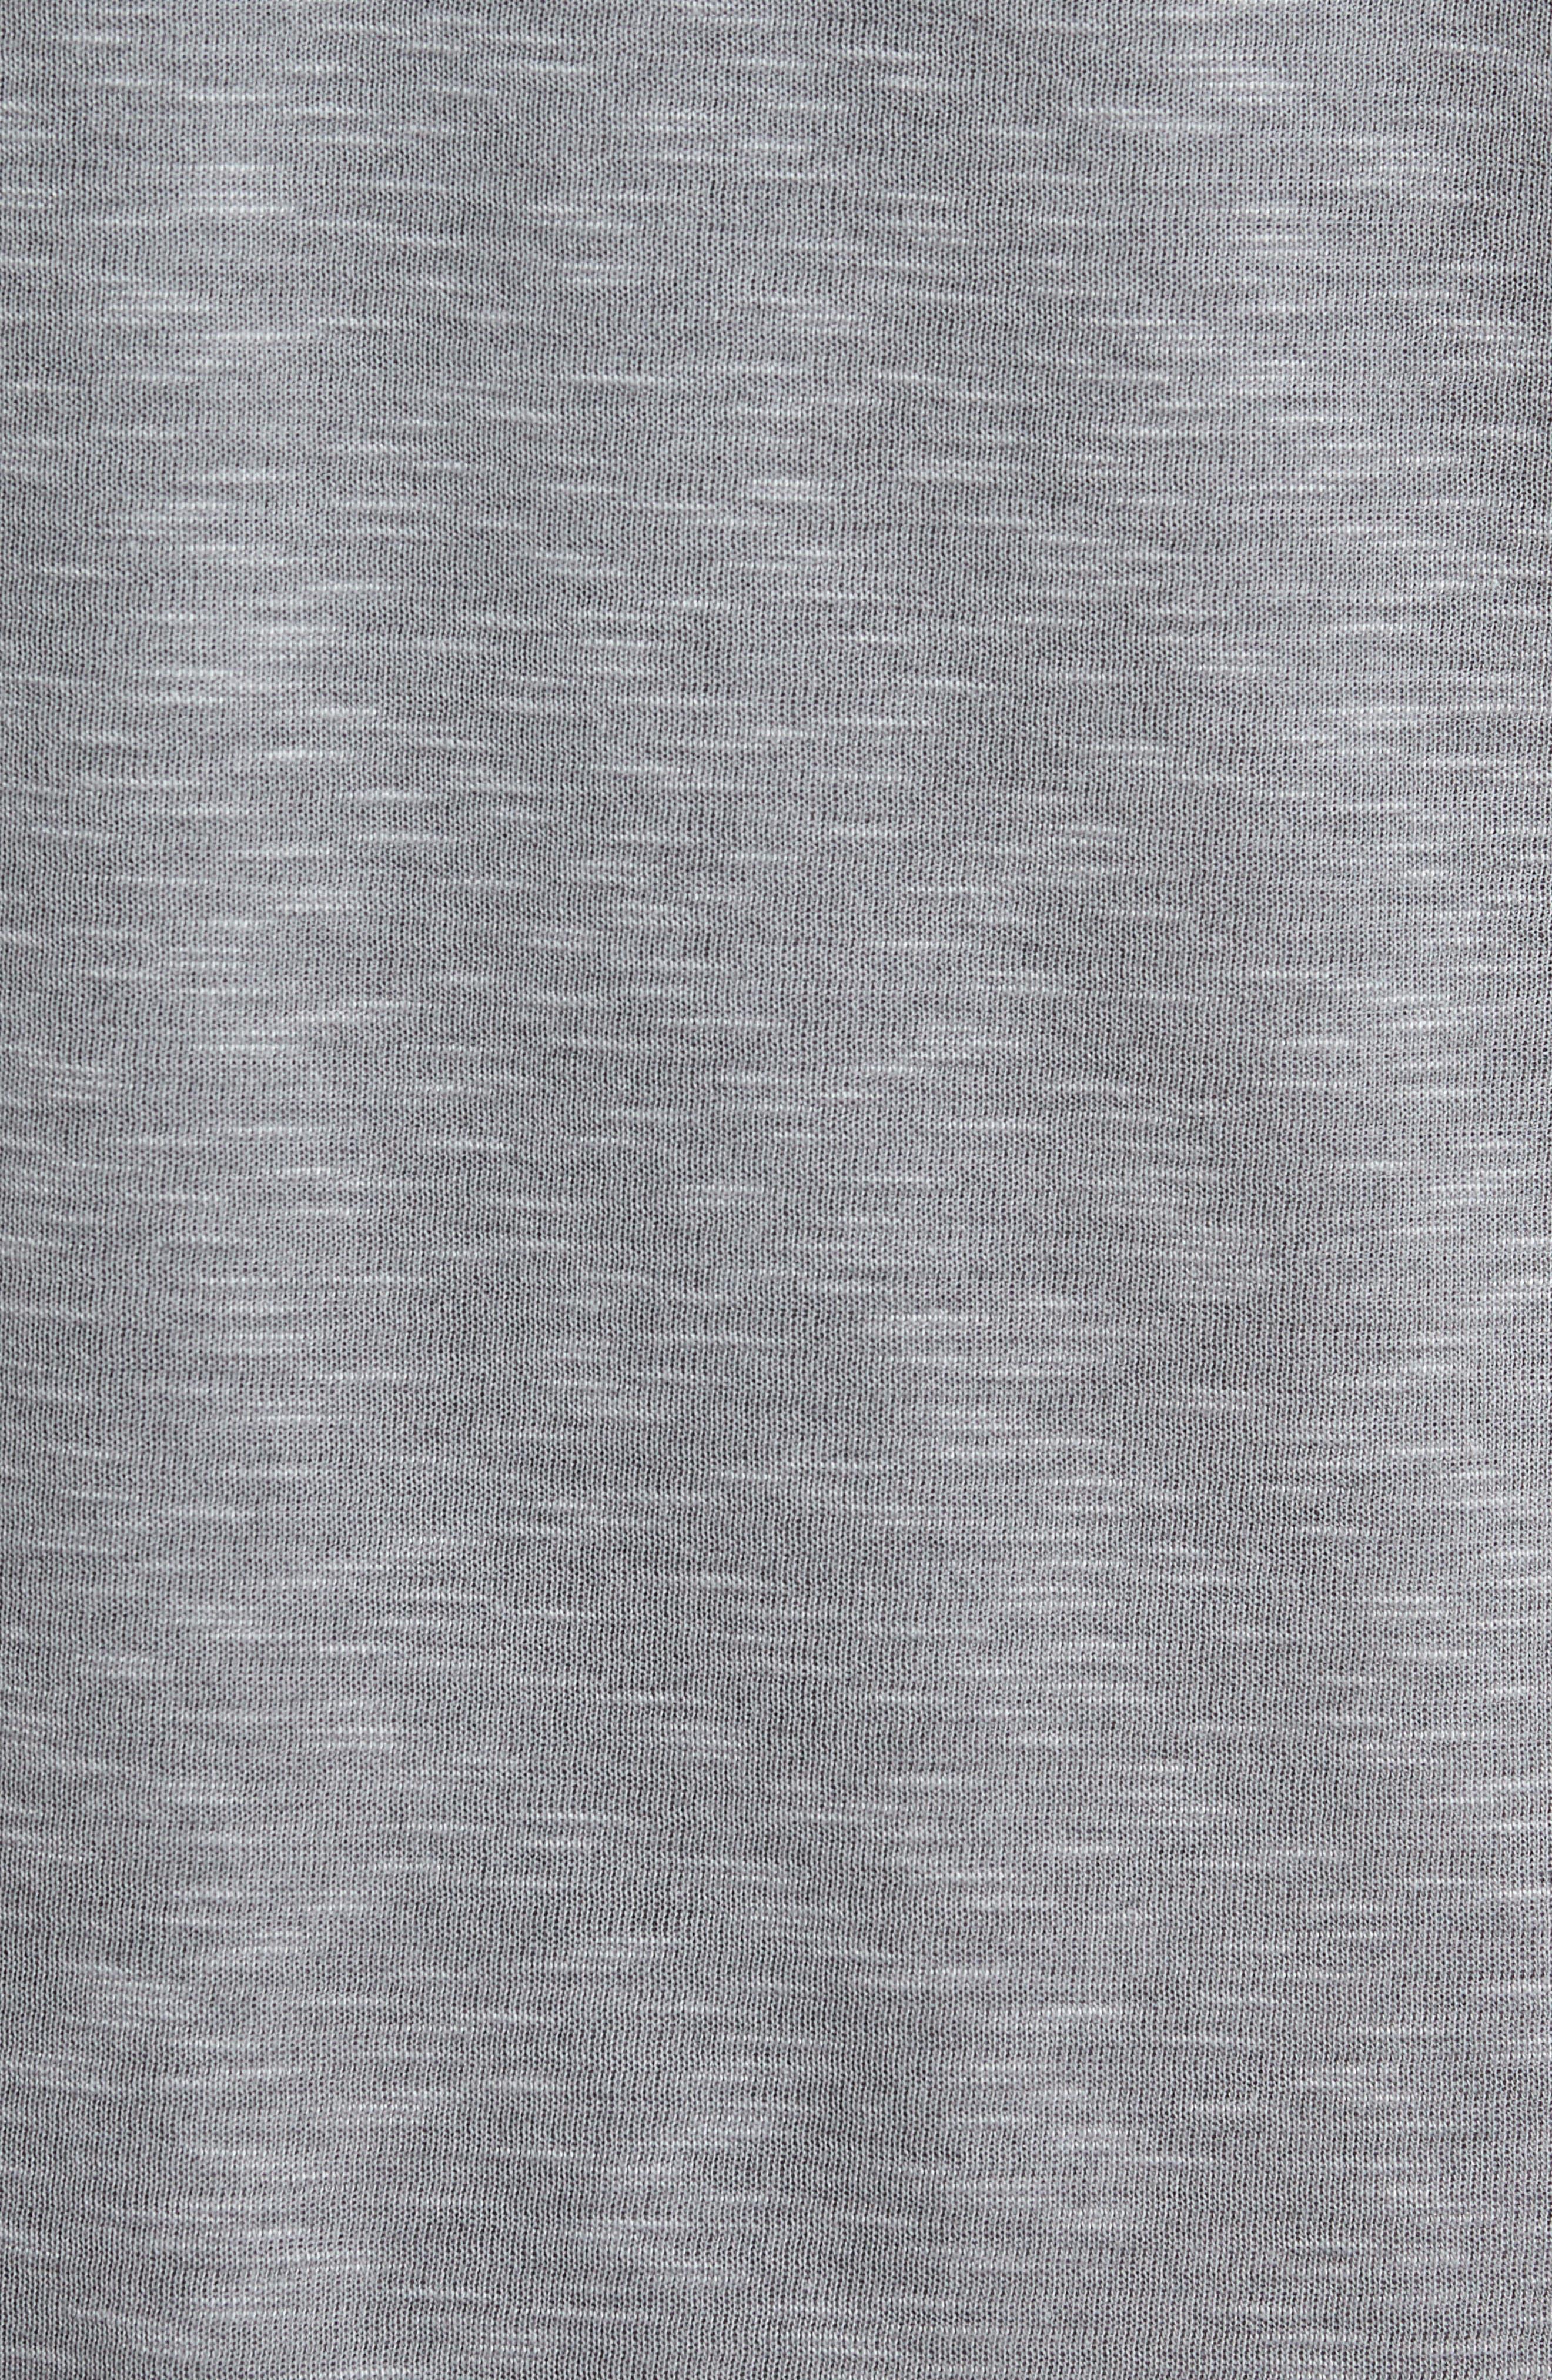 Flip Tide T-Shirt,                             Alternate thumbnail 5, color,                             COAL